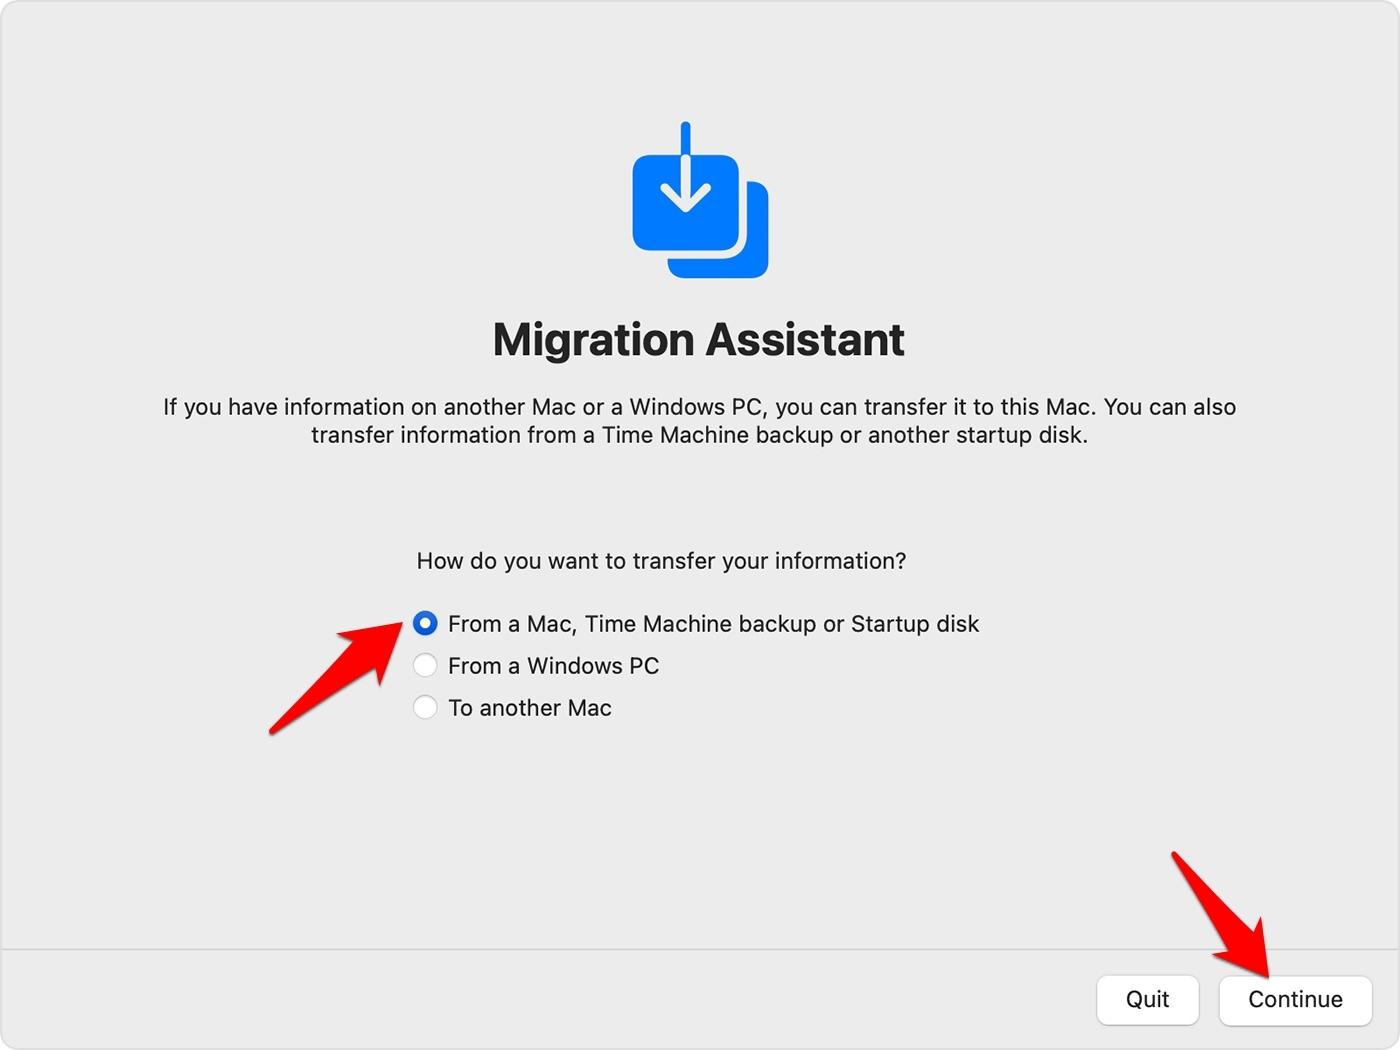 Migration Assistant app in MacOS